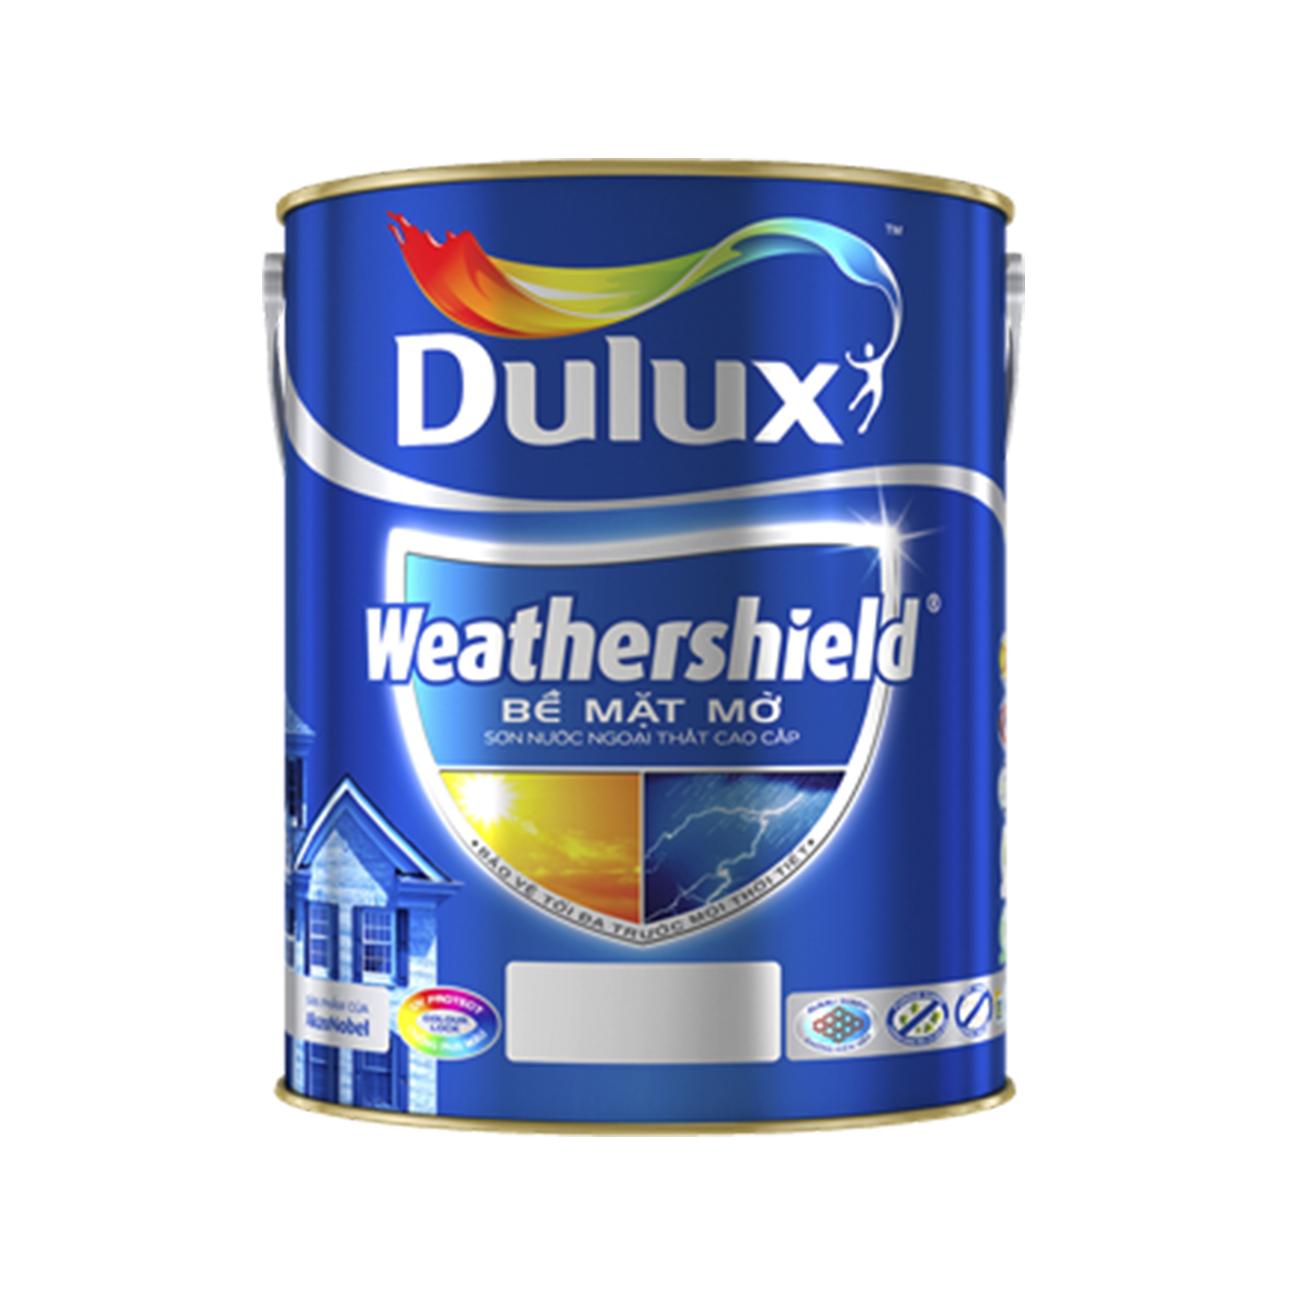 Sơn Ngoại Thất cao cấp Dulux Weathershield 5L - Bề Mặt mờ BJ8-25155